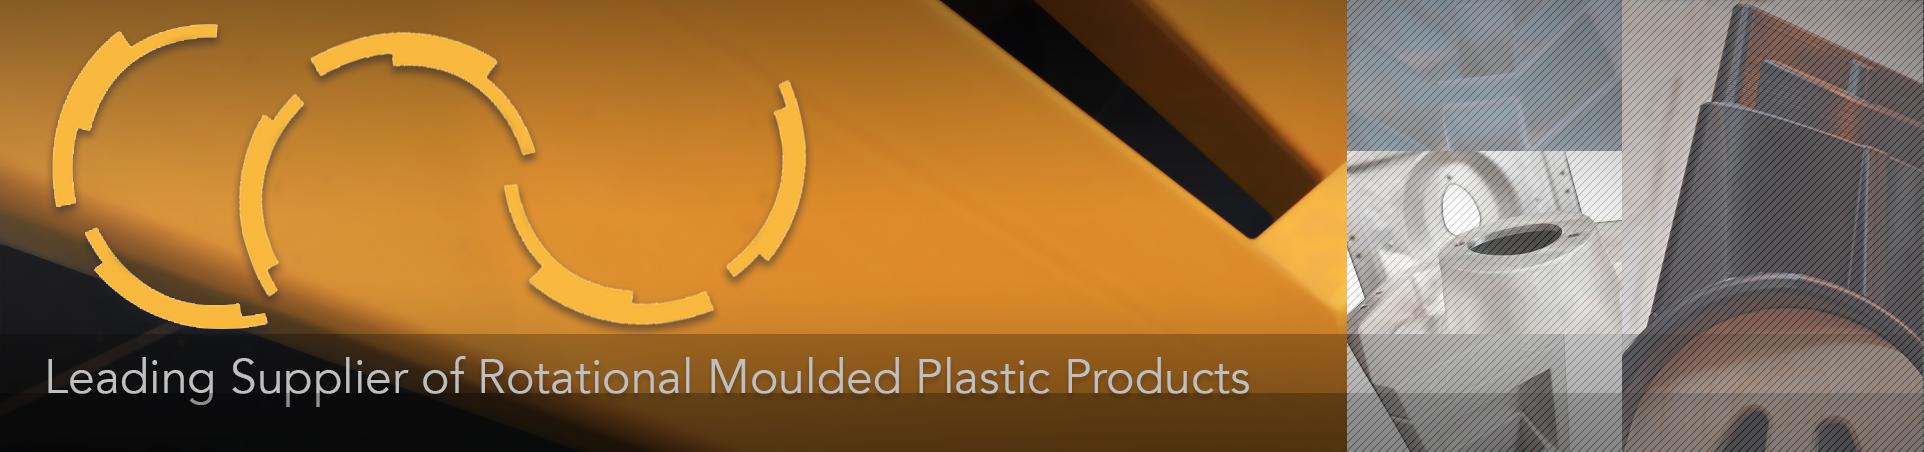 mouldingsmainsplash.png